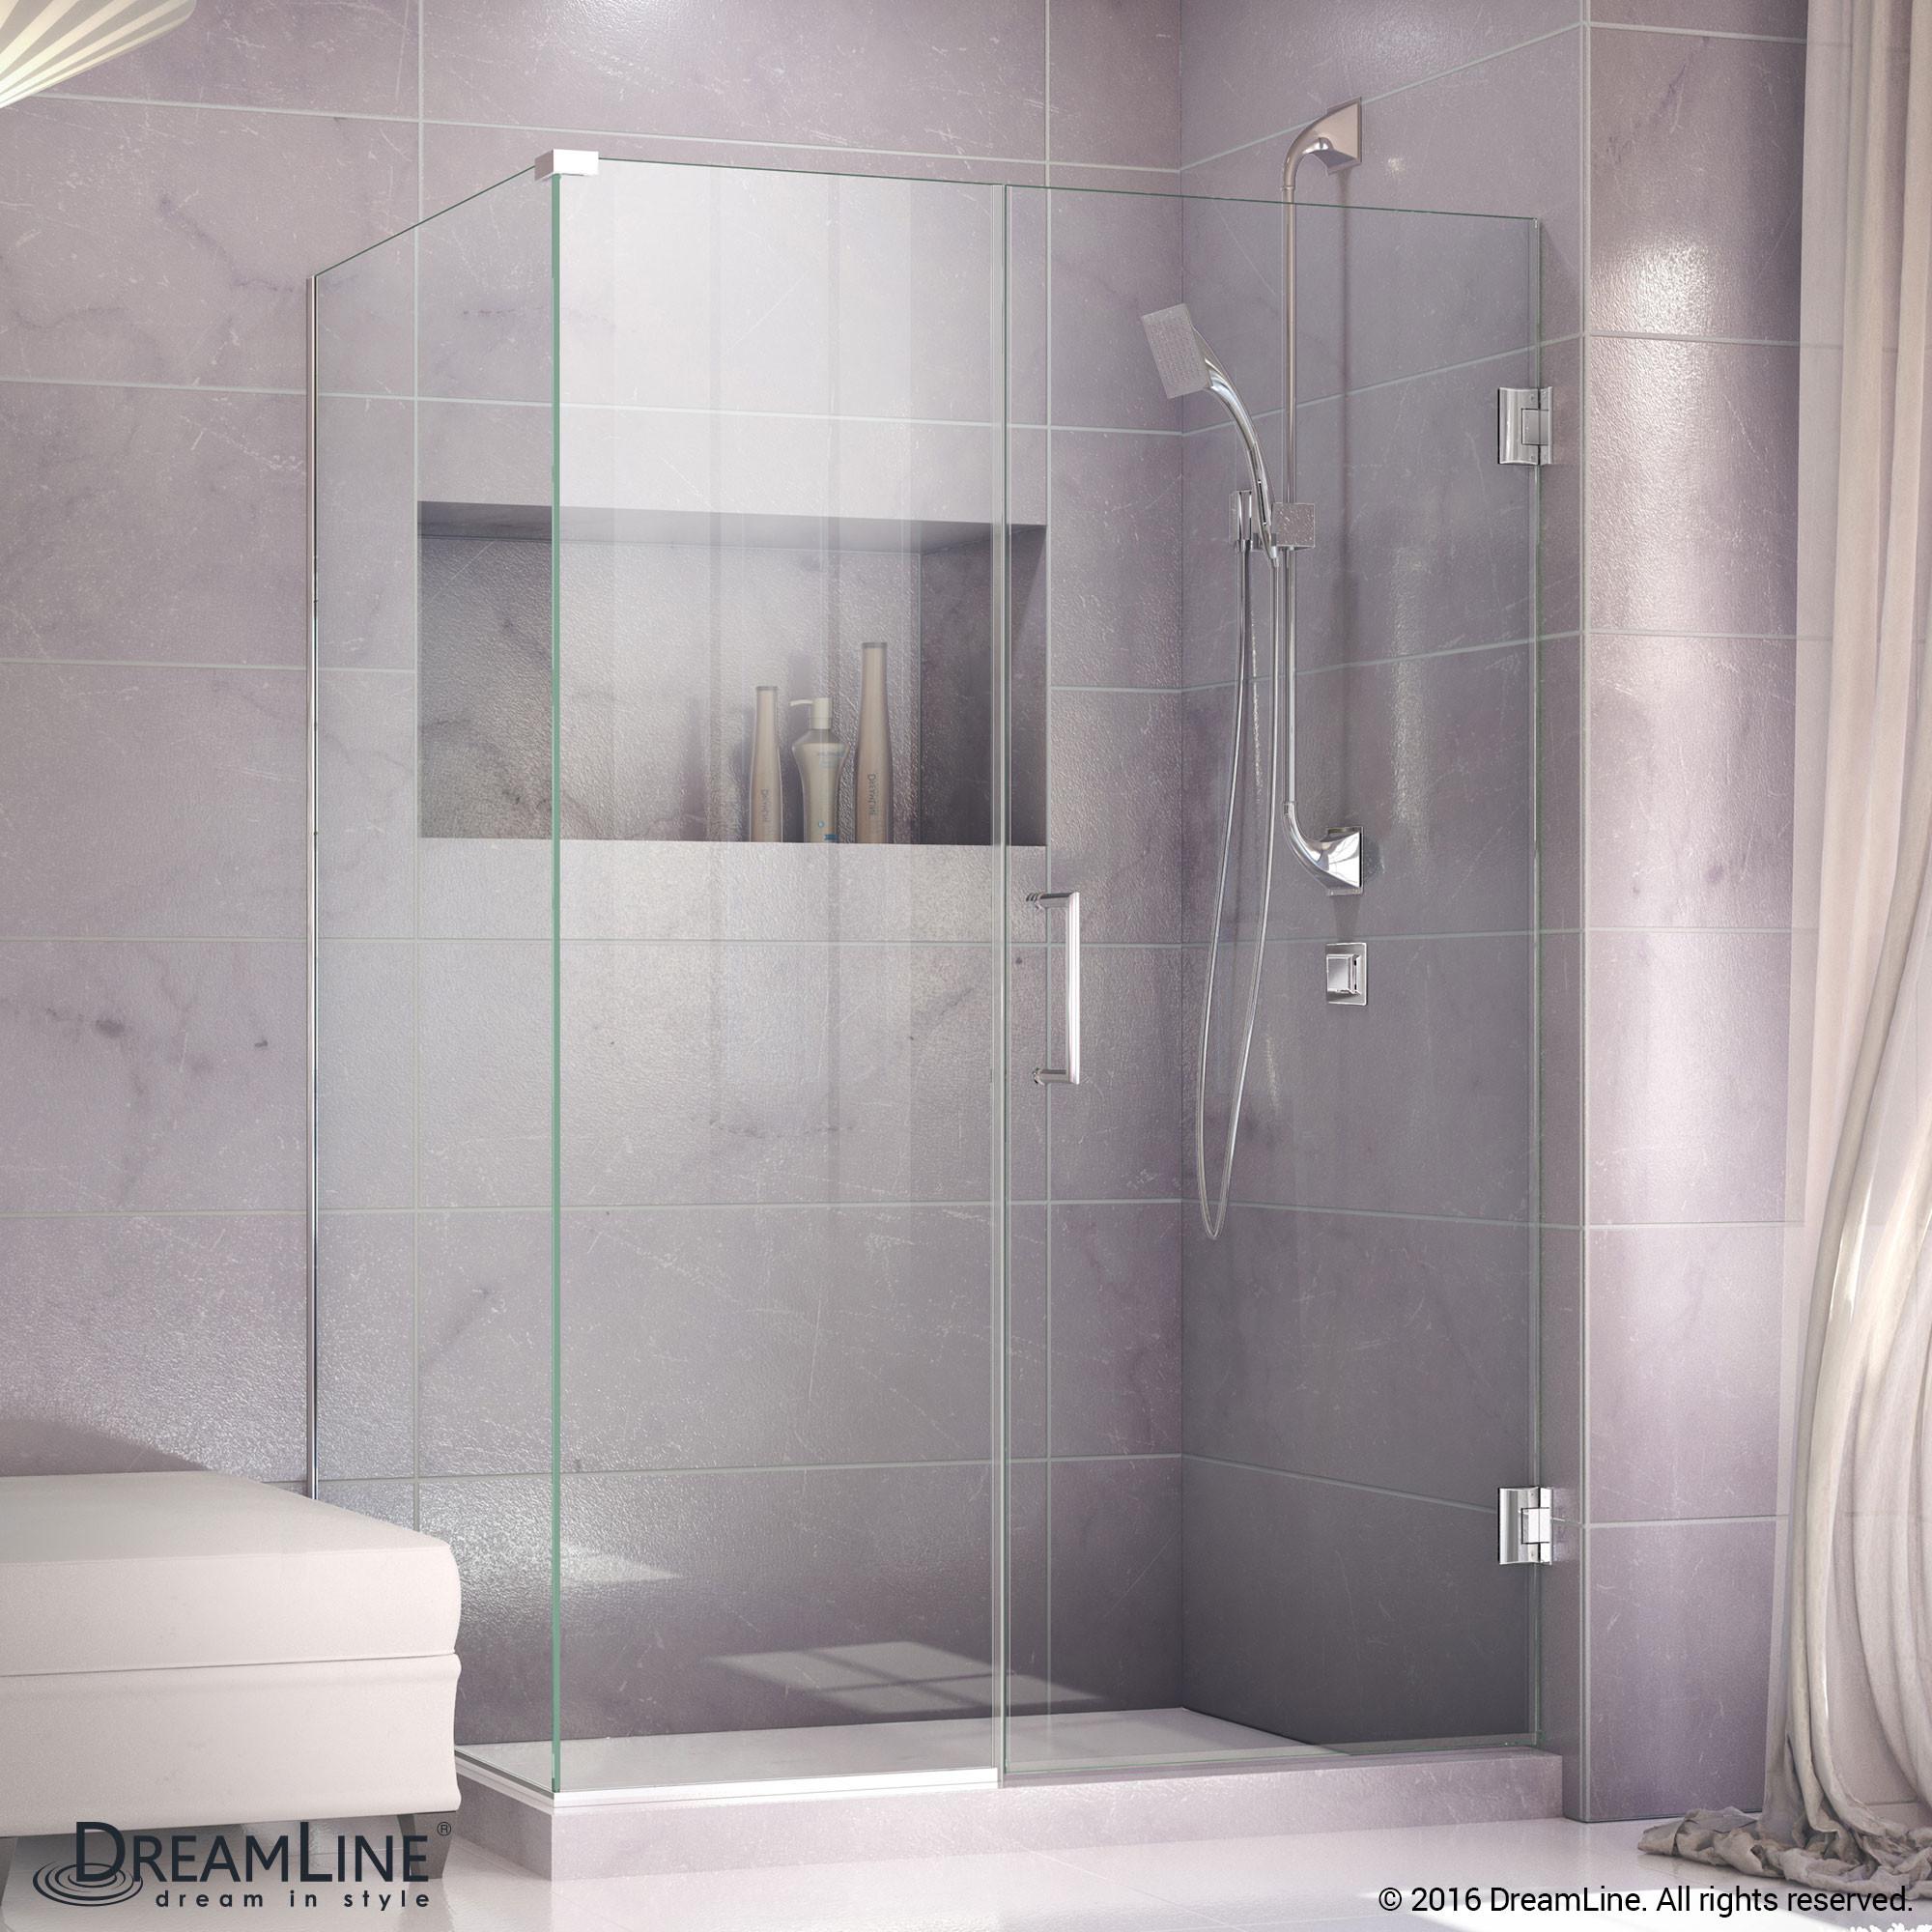 DreamLine SHEN-24365340-01 Unidoor Plus Hinged Shower Enclosure In Chrome Finish Hardware